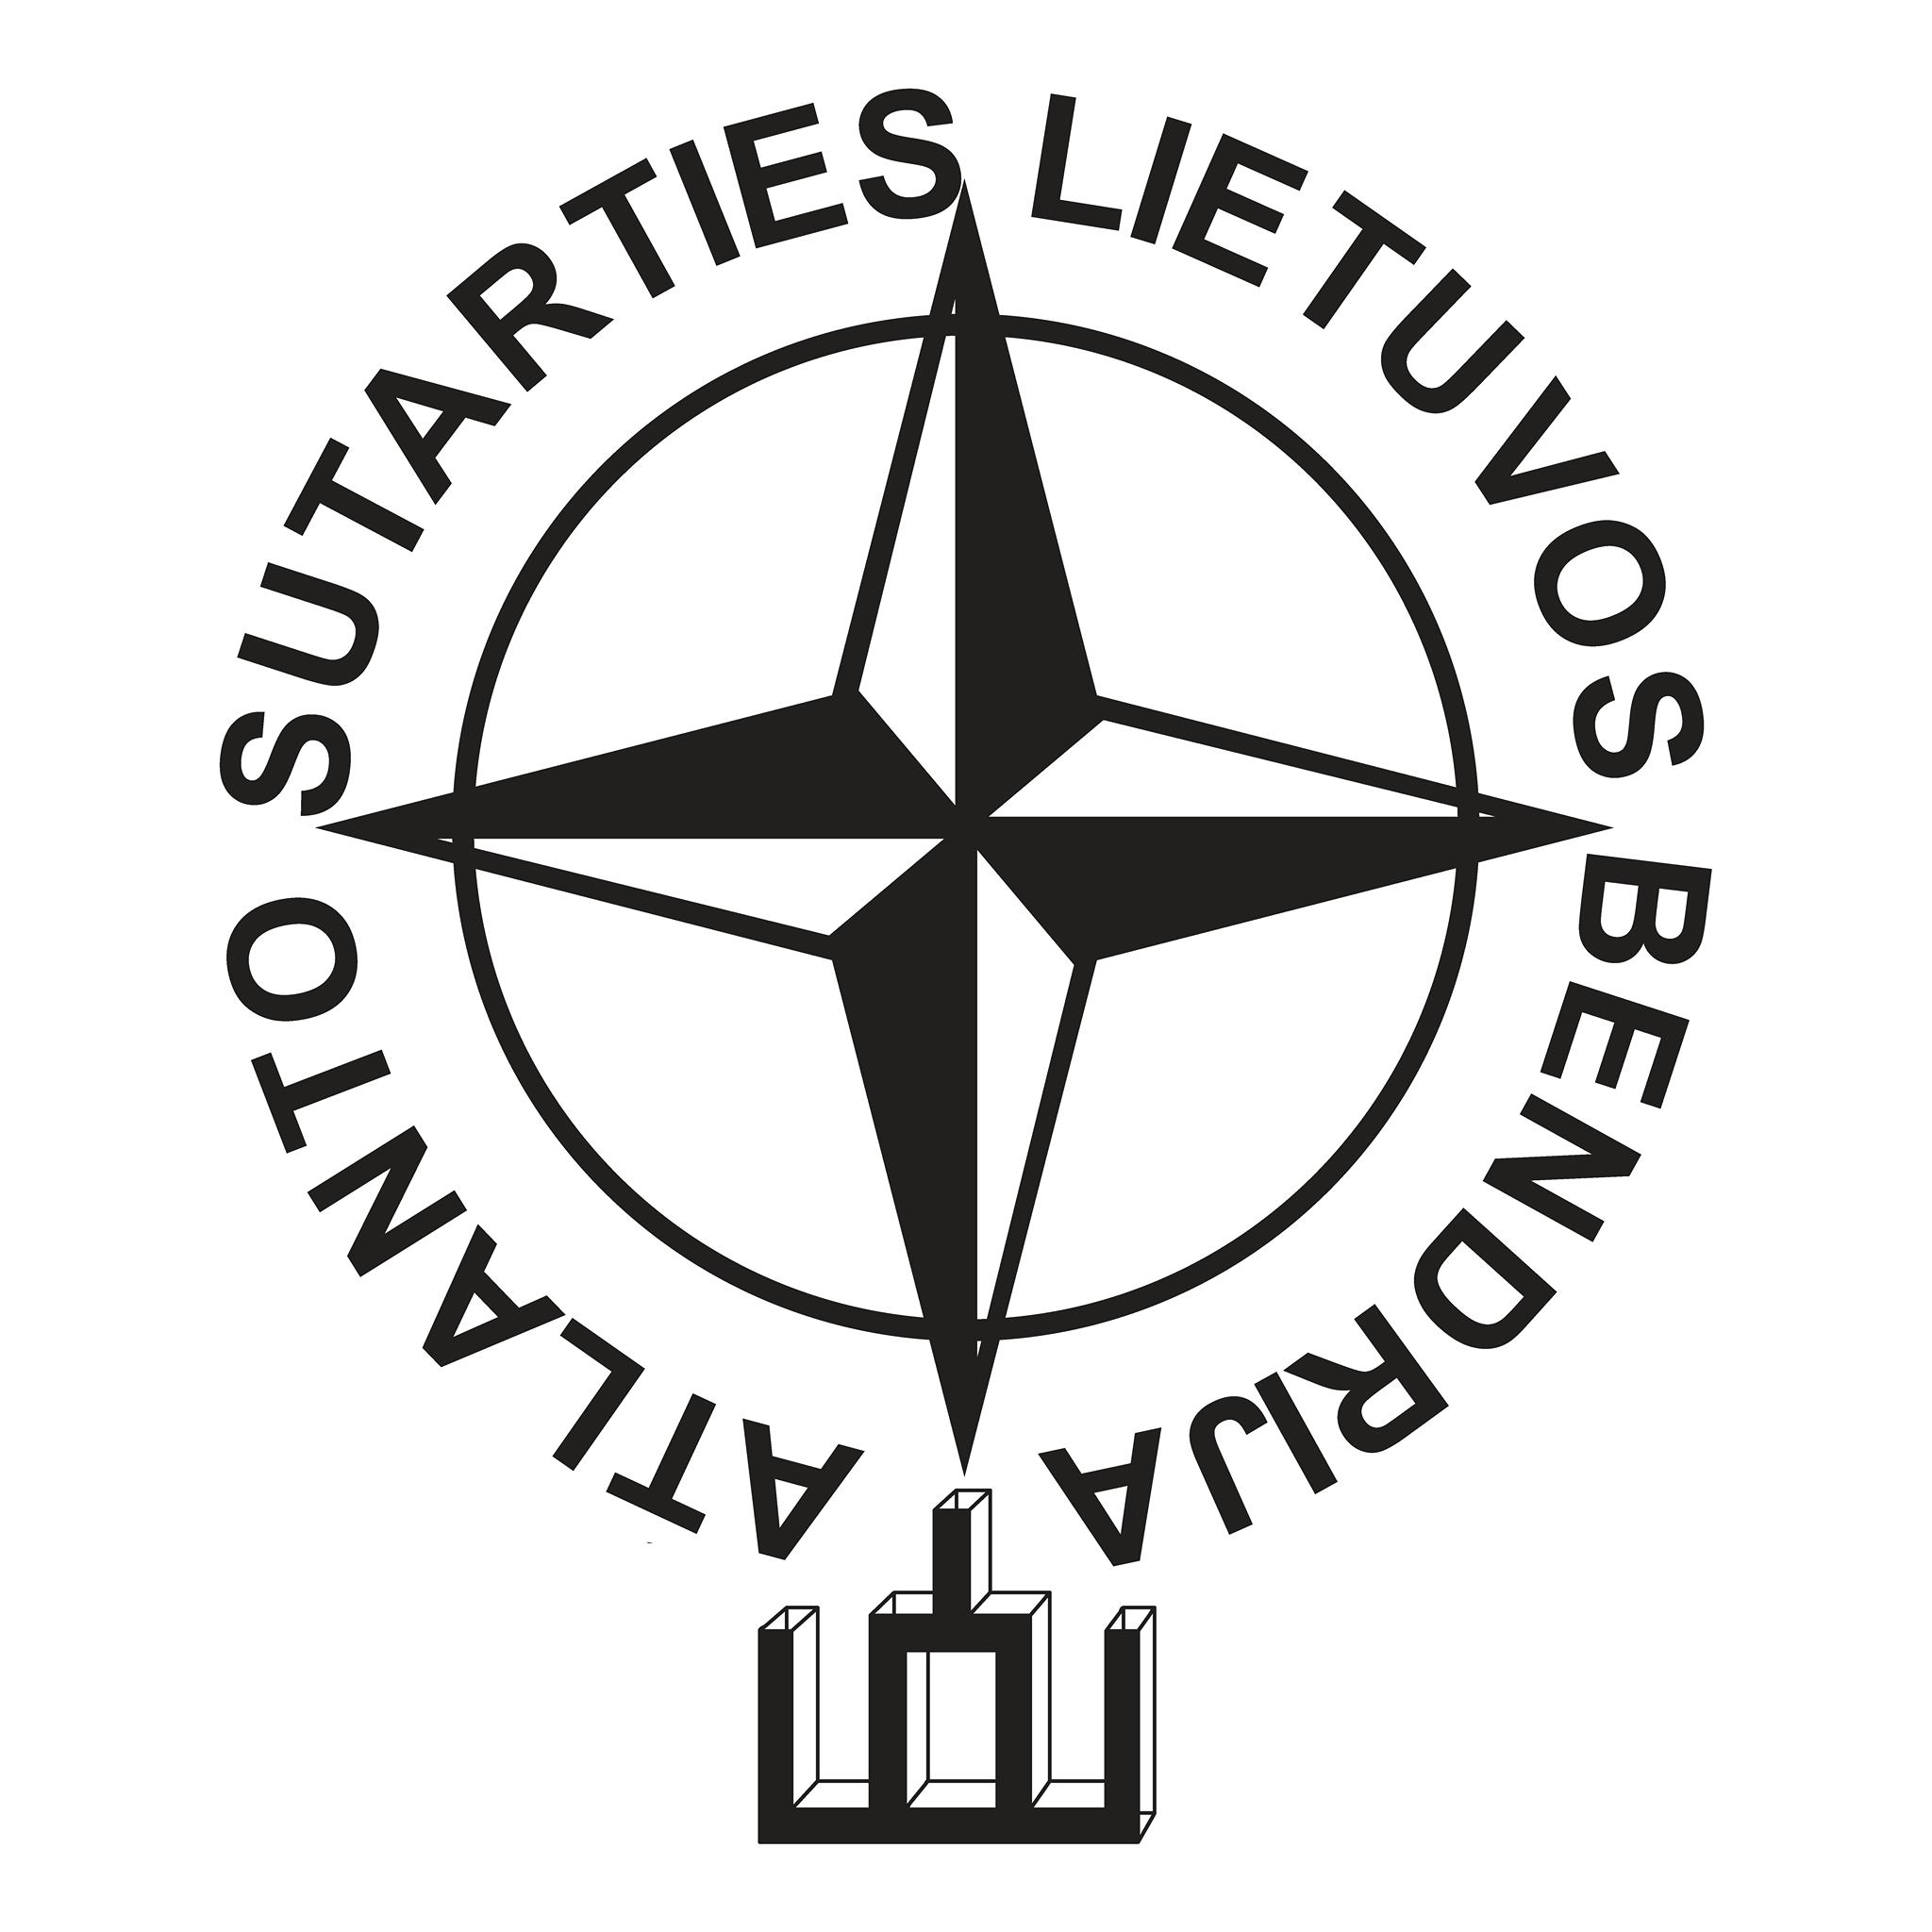 YATA Lithuania / Atlanto sutarties Lietuvos bendrija - LATA